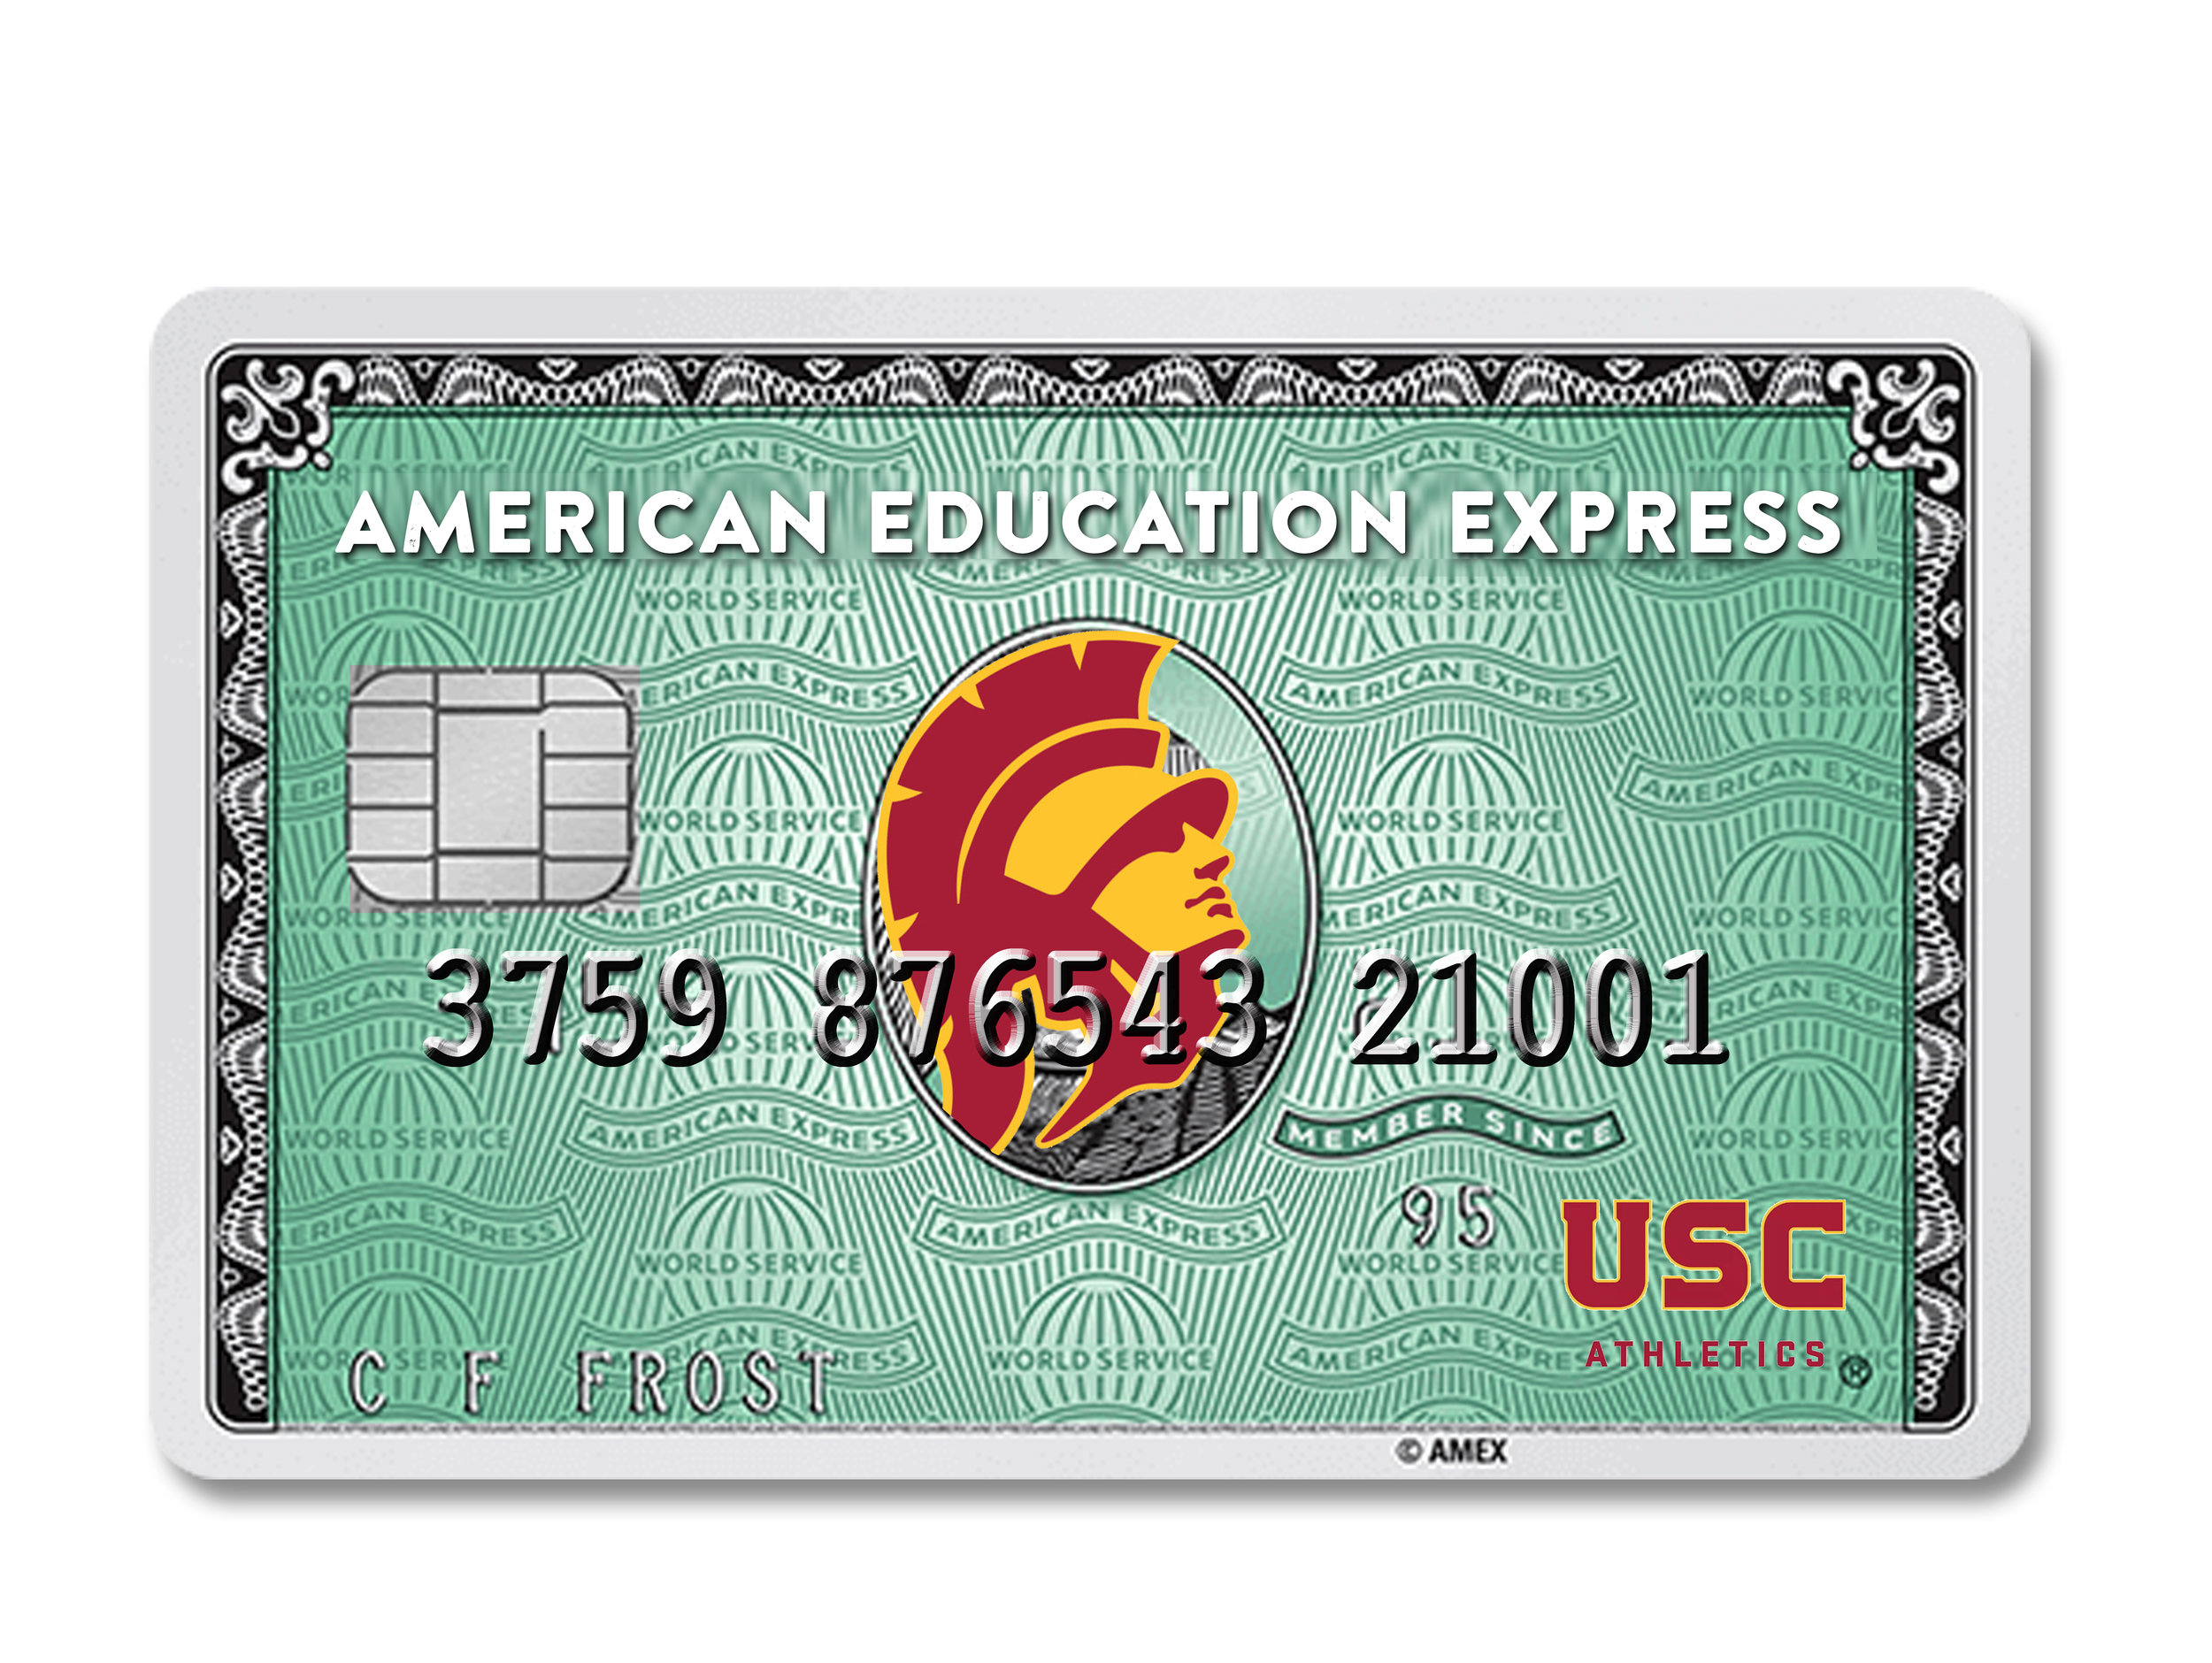 20190313 - MAD - American Education Express.jpg